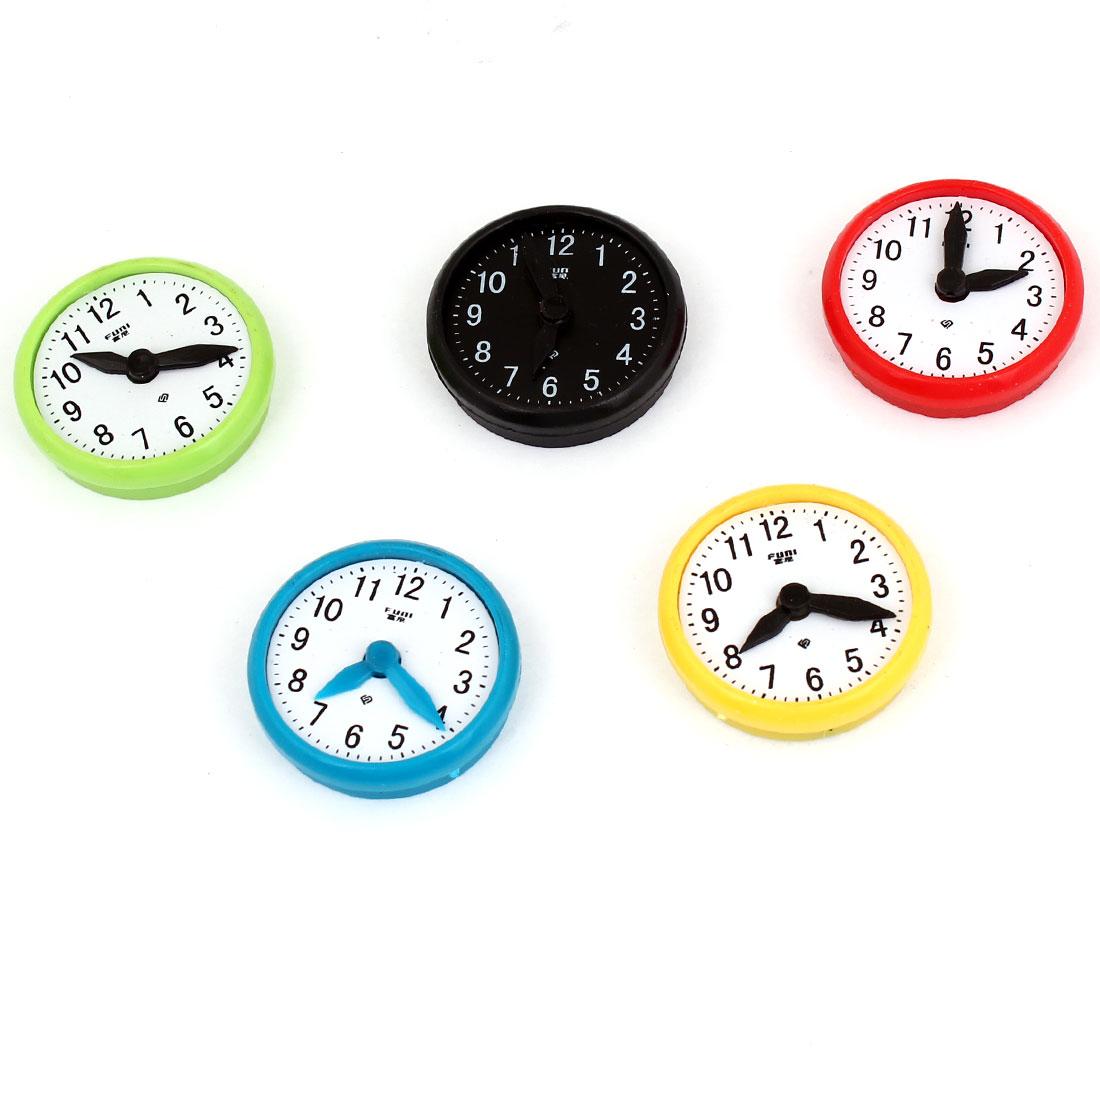 "5pcs Plastic Clock Design Washing Machine Fridge Magnets 1.4"" Dia"